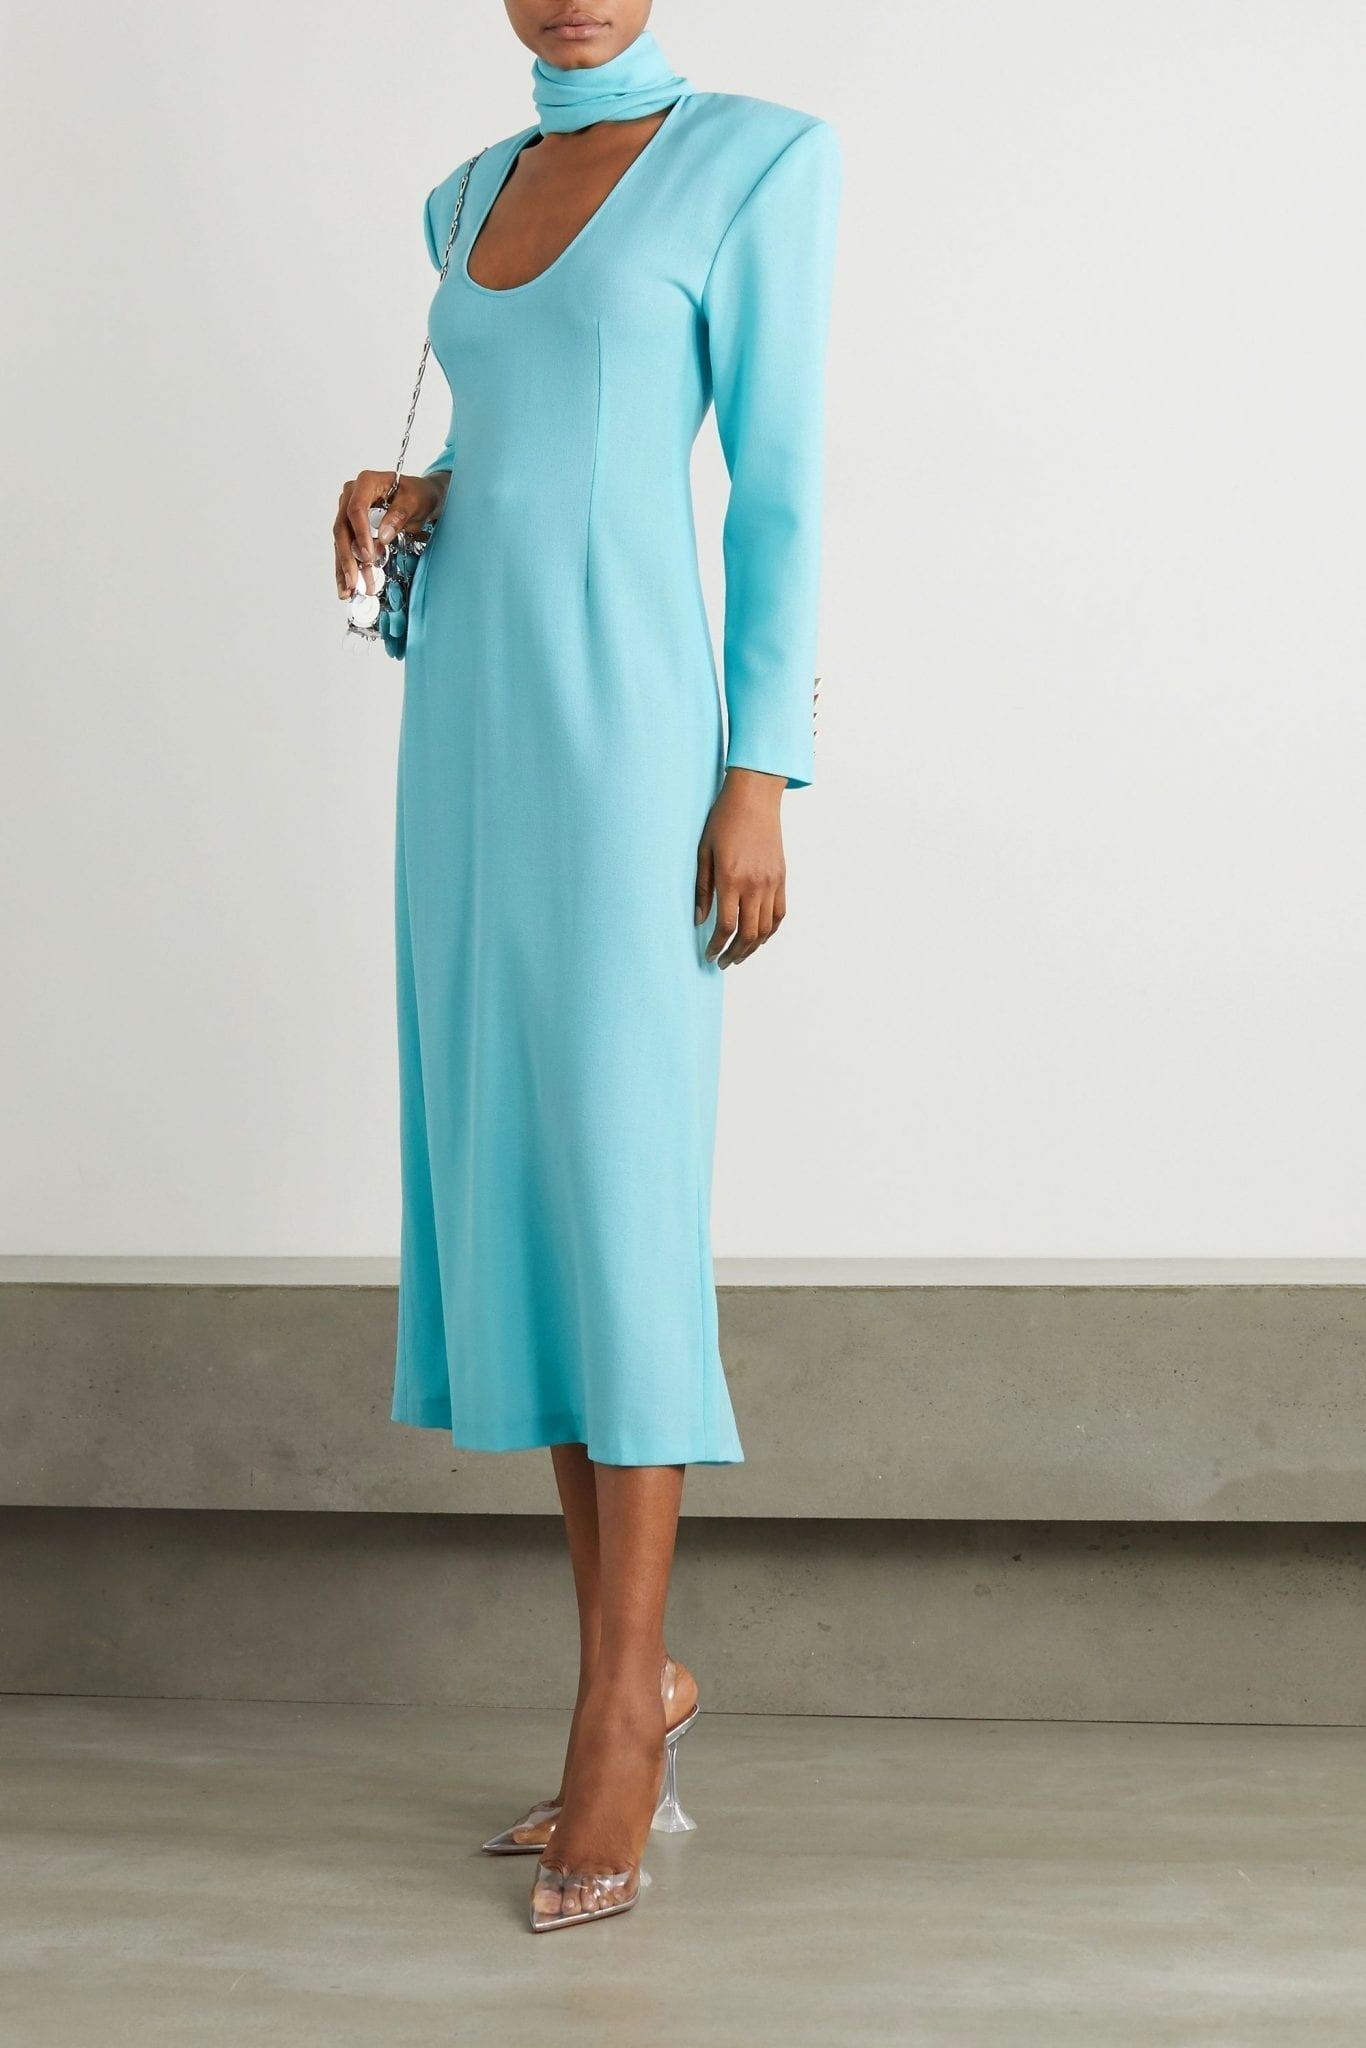 ROWEN ROSE Cutout Wool-crepe Midi Dress